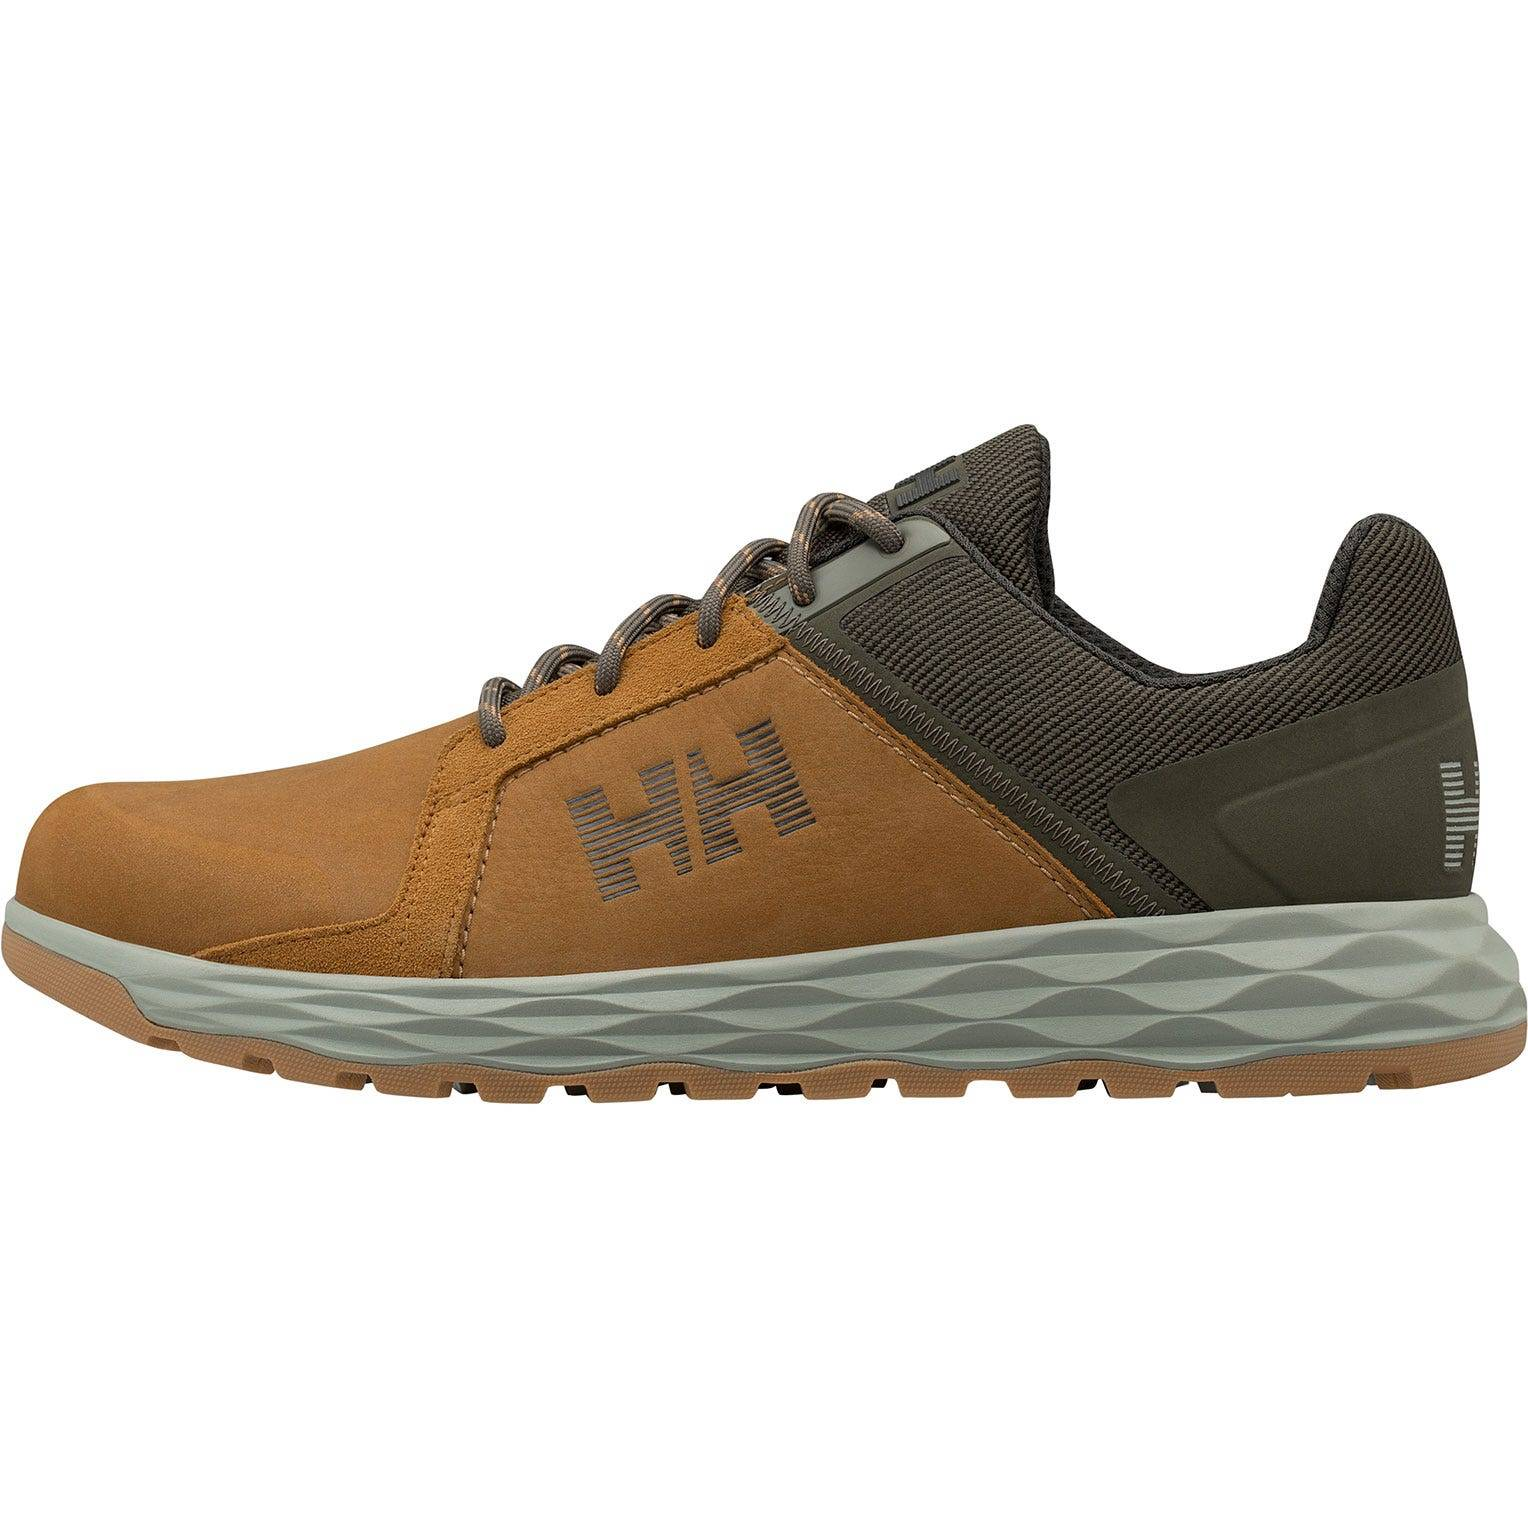 Helly Hansen Gambier Lc Mens Casual Shoe Brown 42/8.5